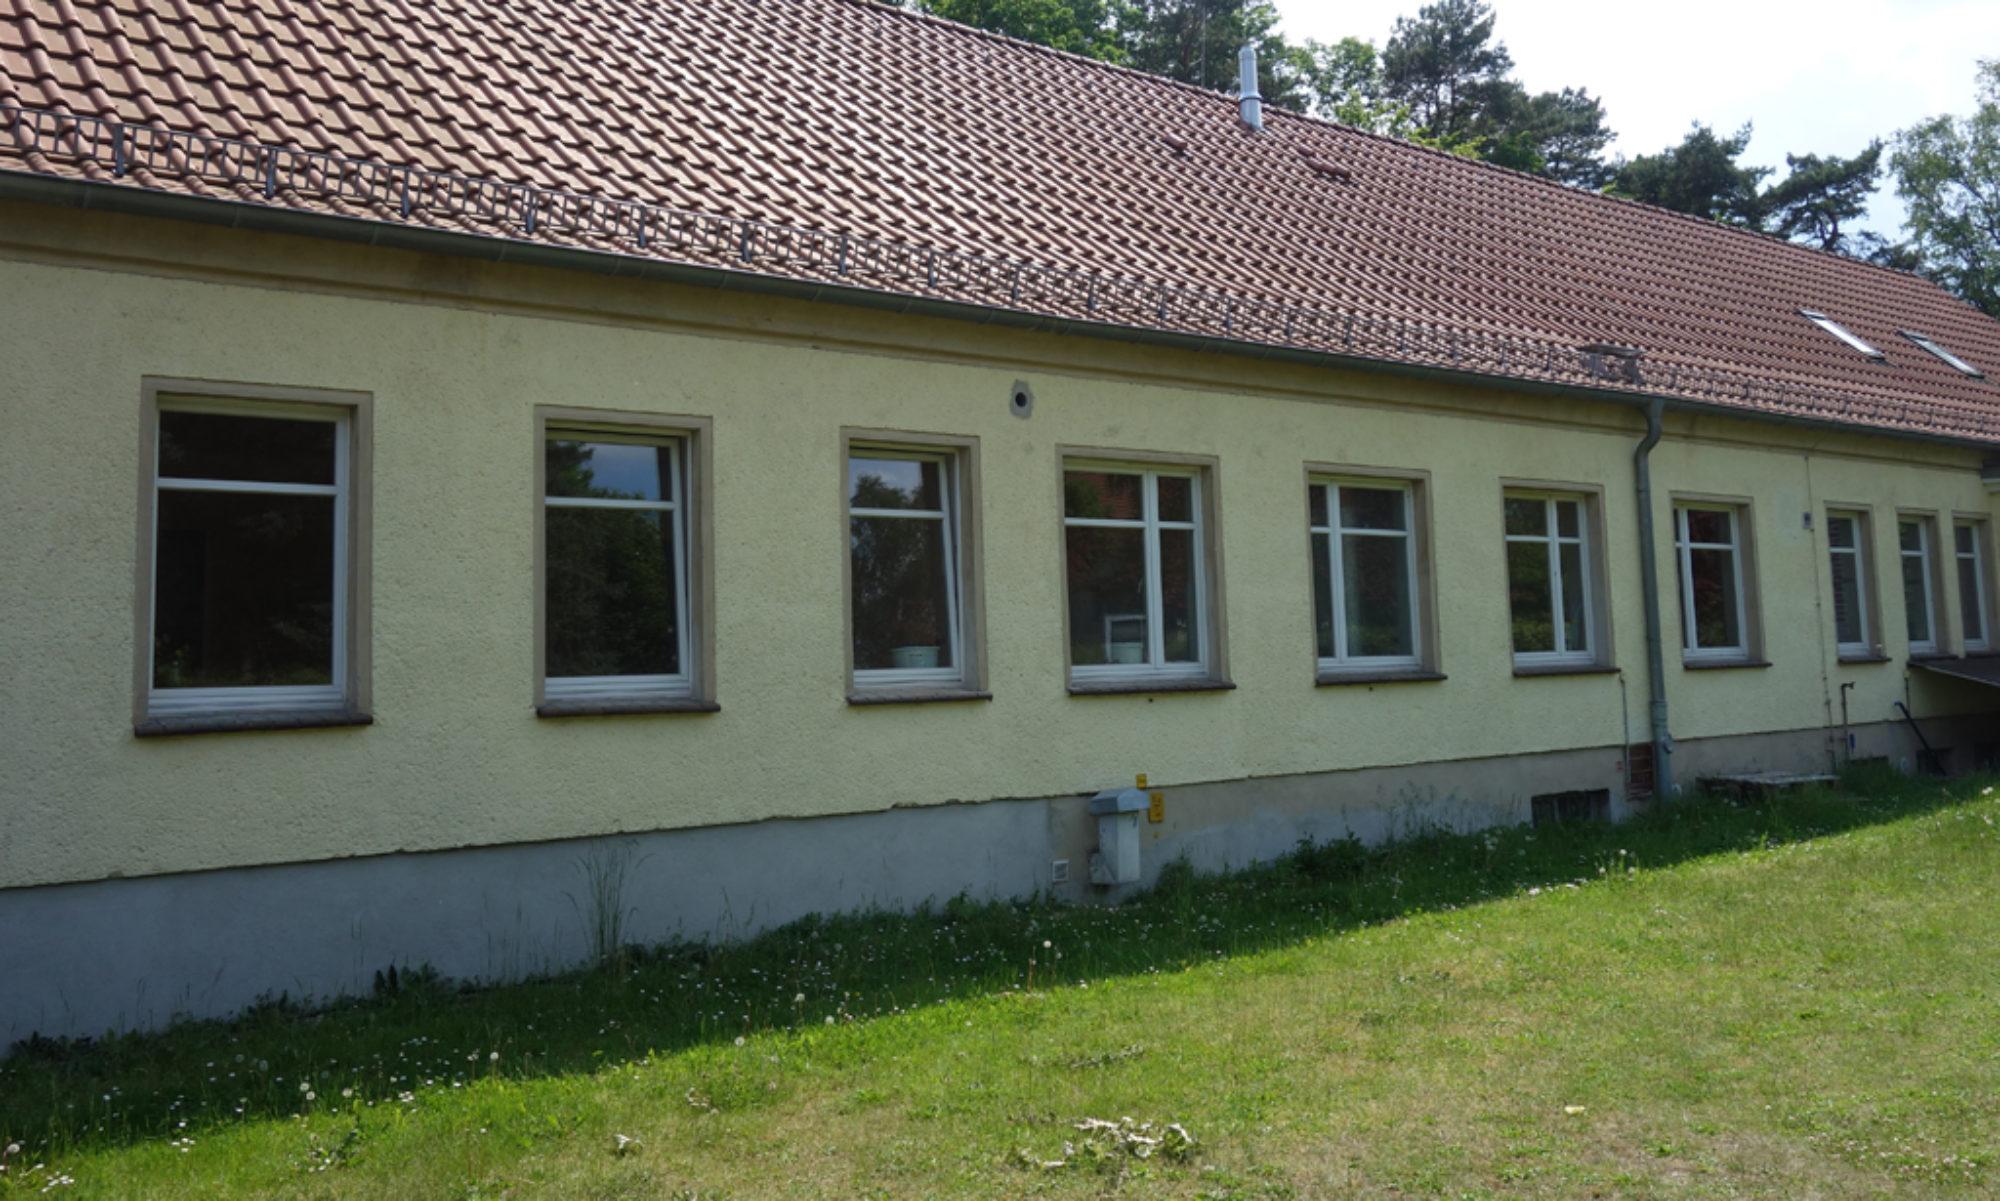 Freie Oberschule Fläming